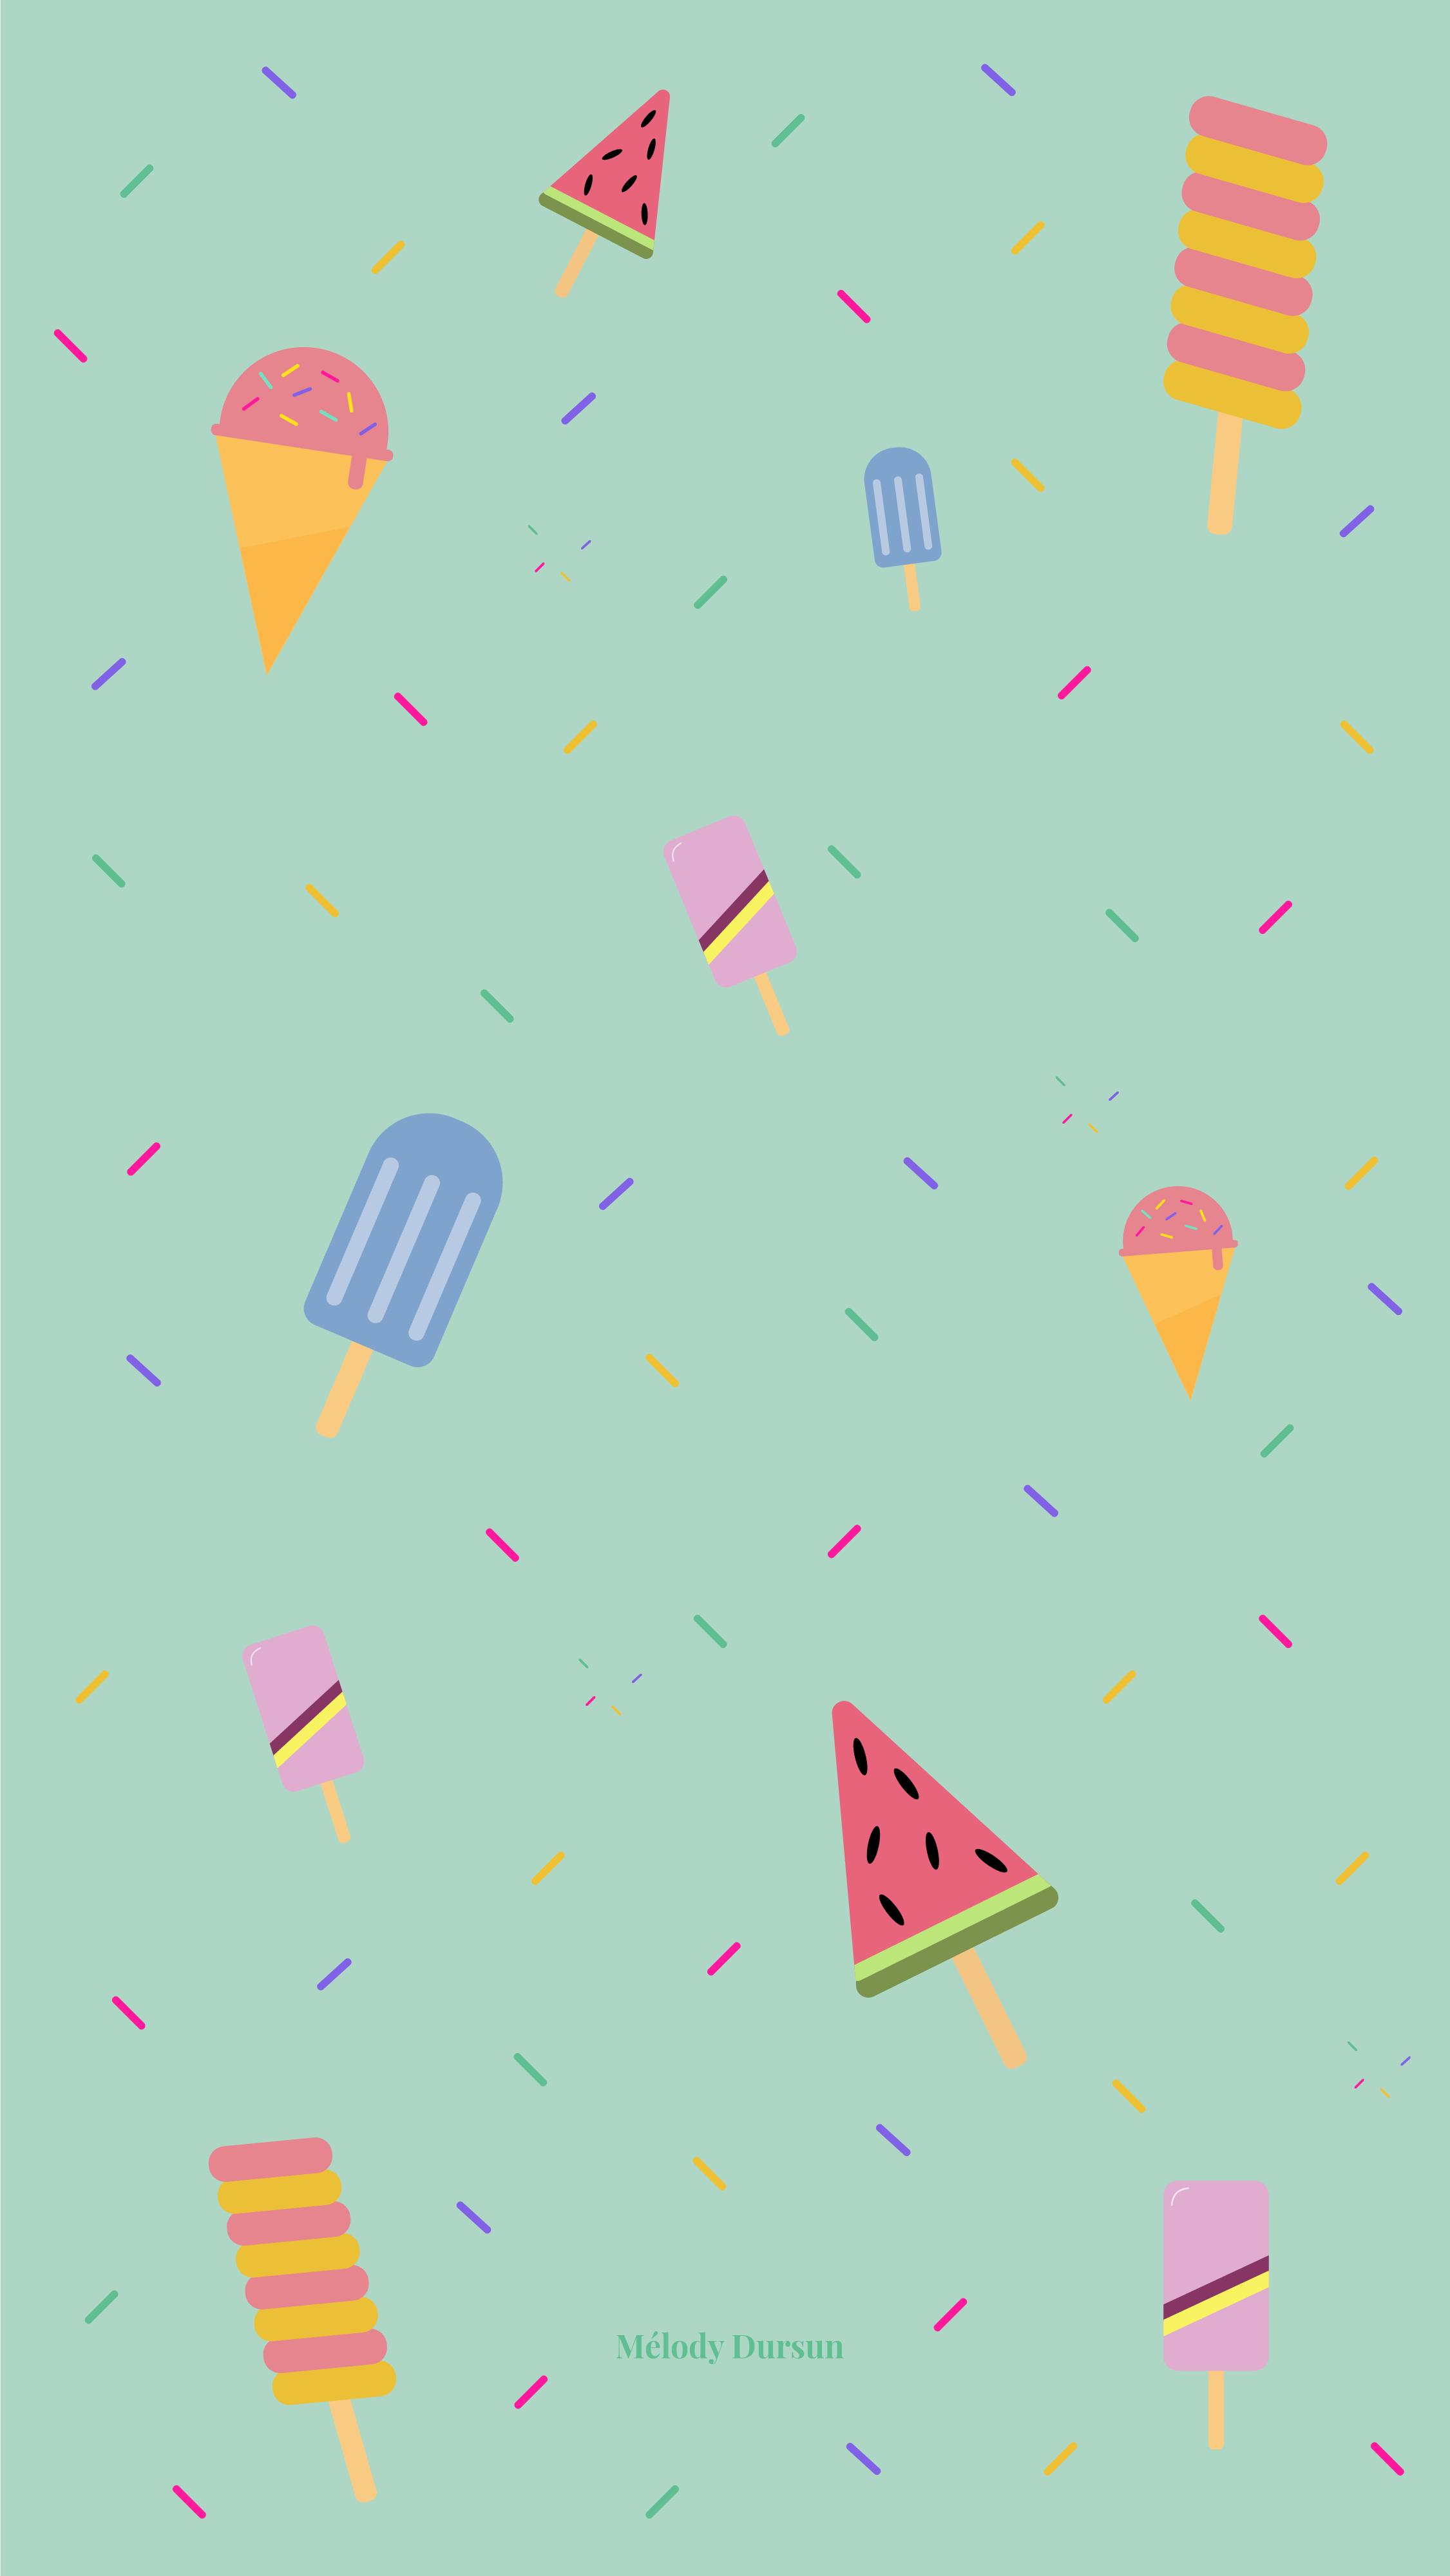 olecoeur-melodydursun-fond-juillet2019-iphone6plus